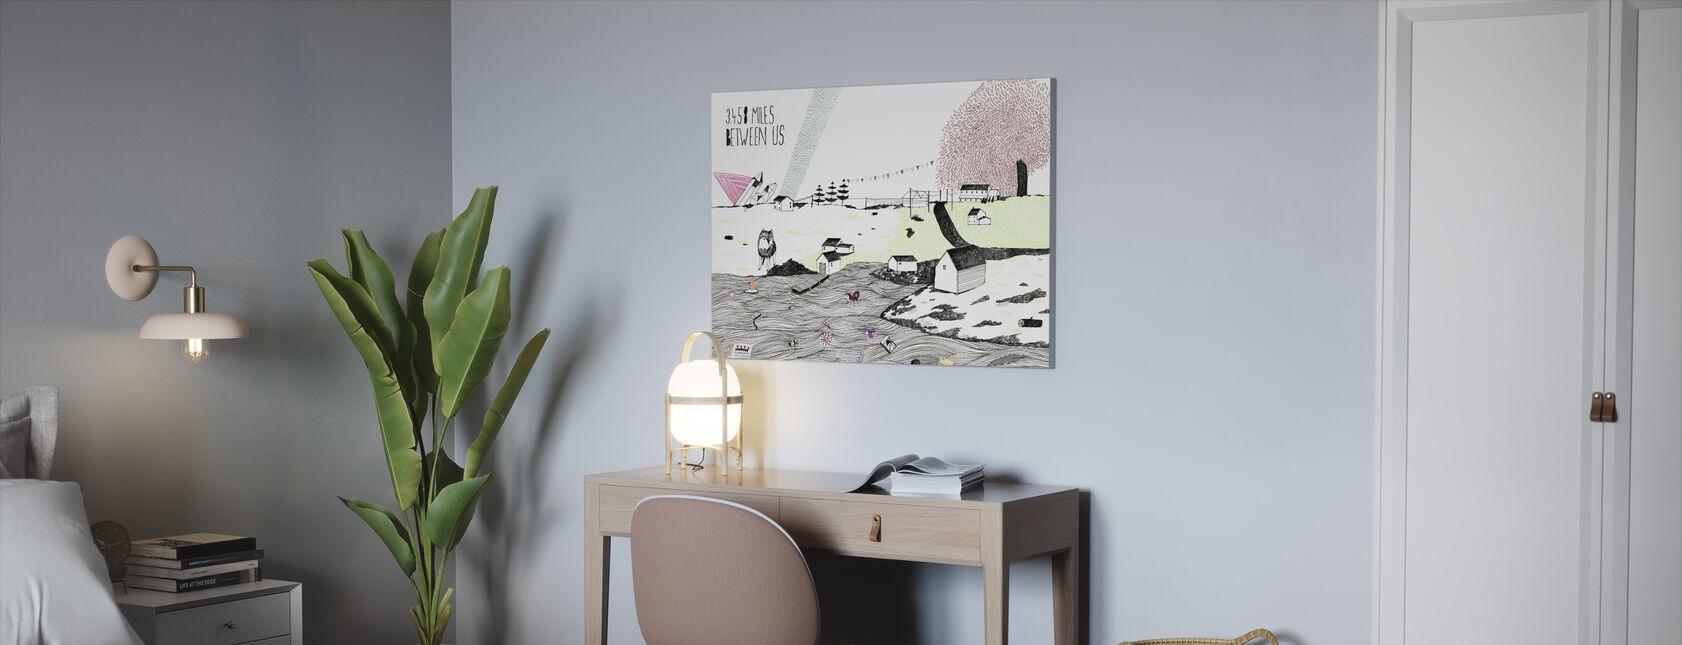 Miles Between Us - Canvas print - Office